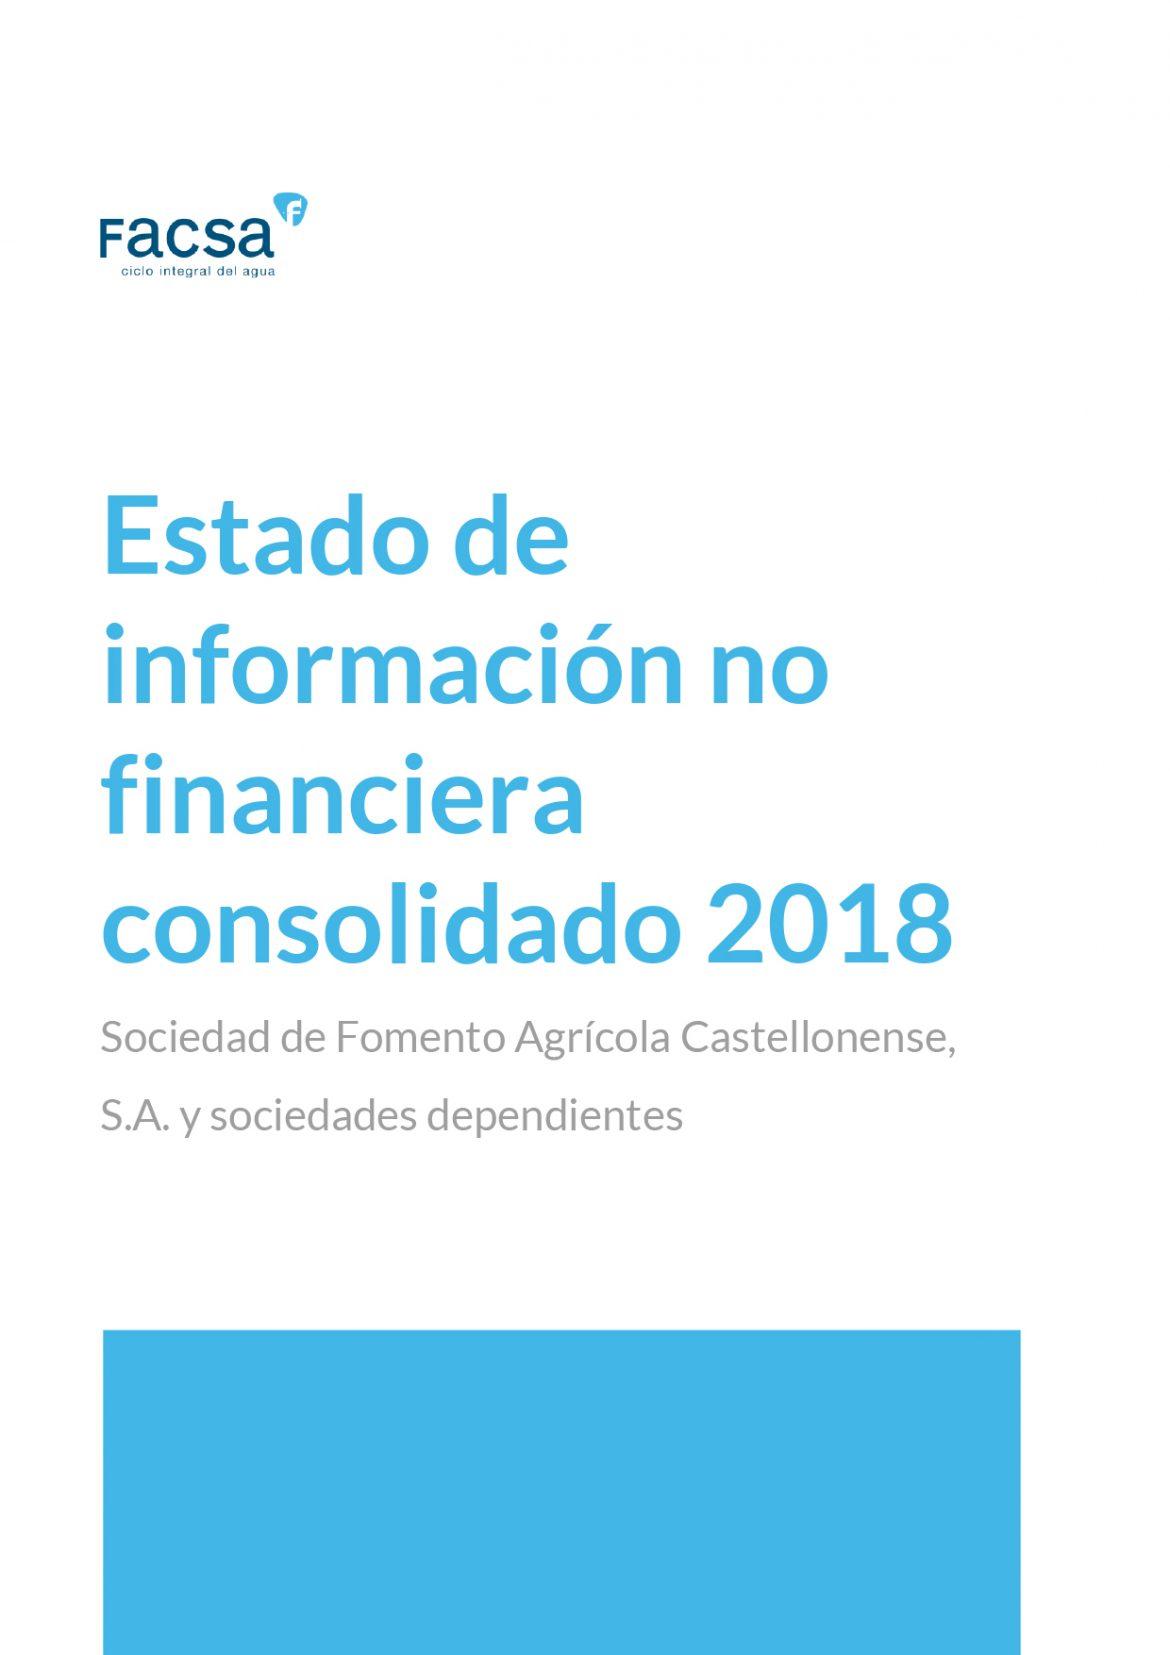 OK_Adaptado_Portada-EINF_2018.jpg